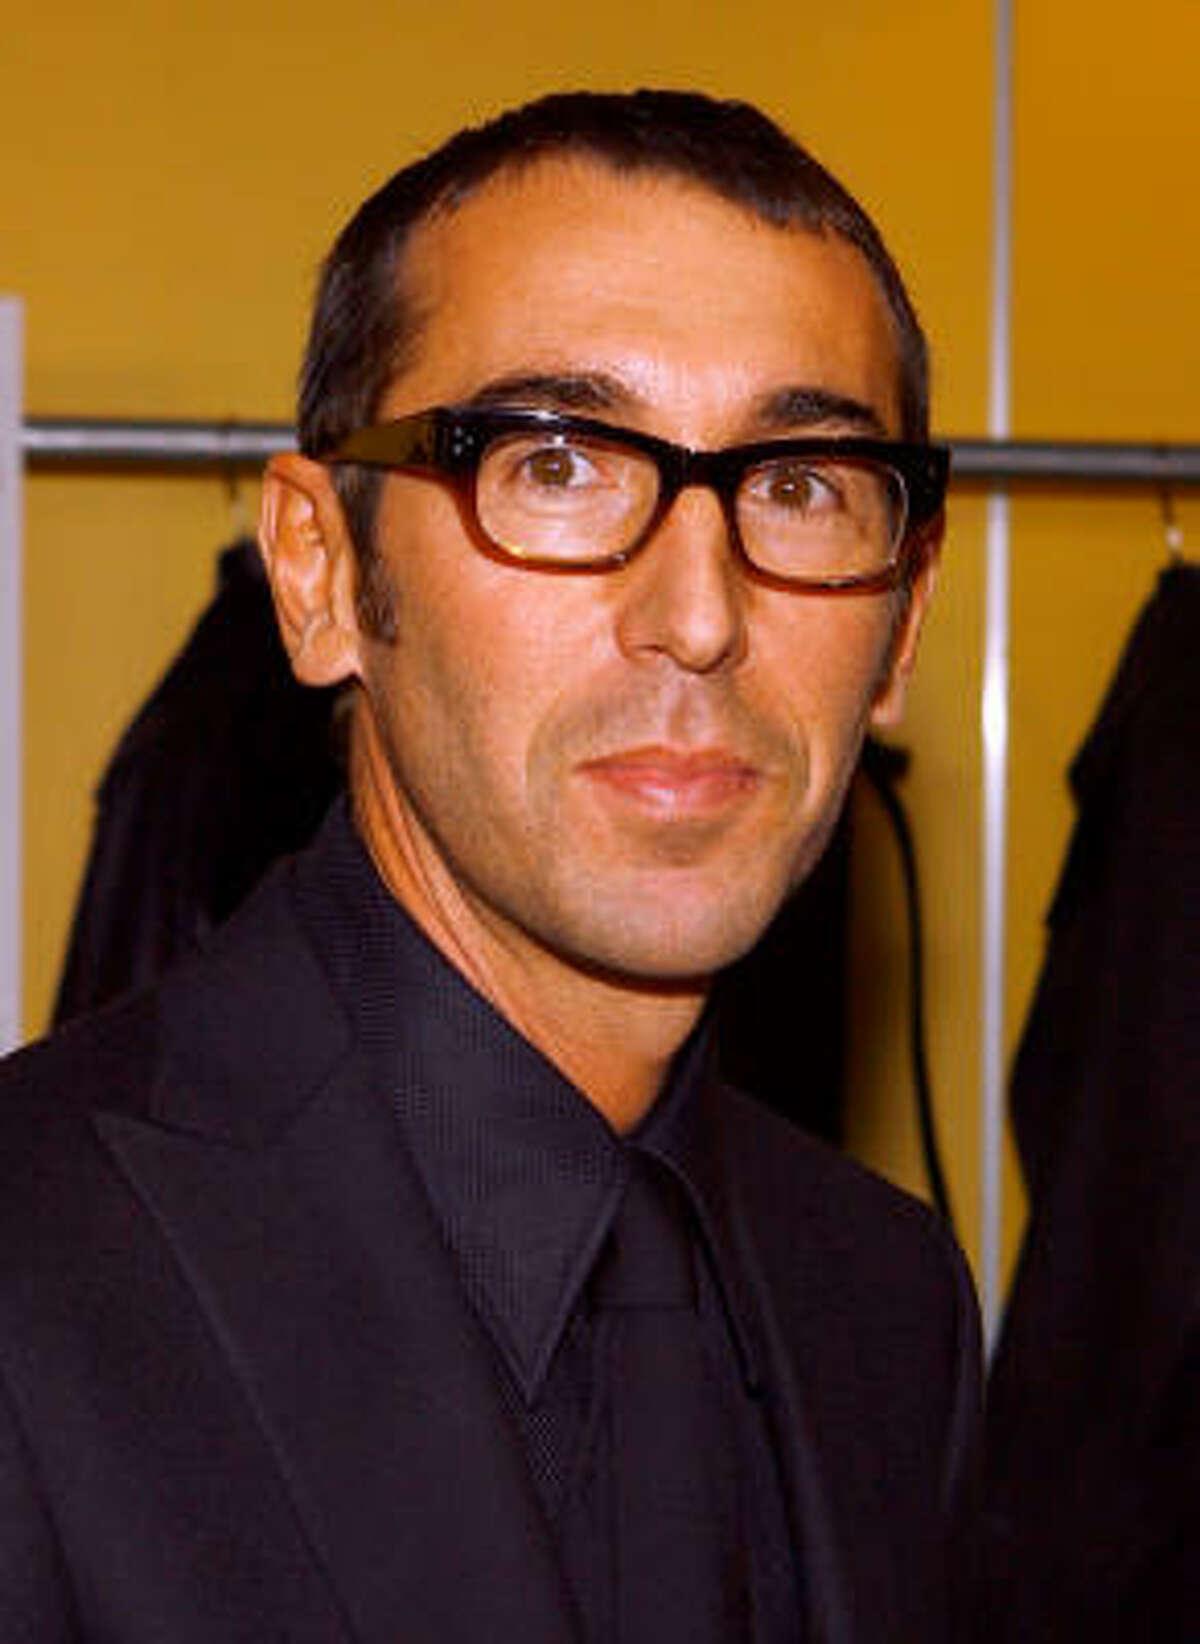 Designer Alessandro Sartori